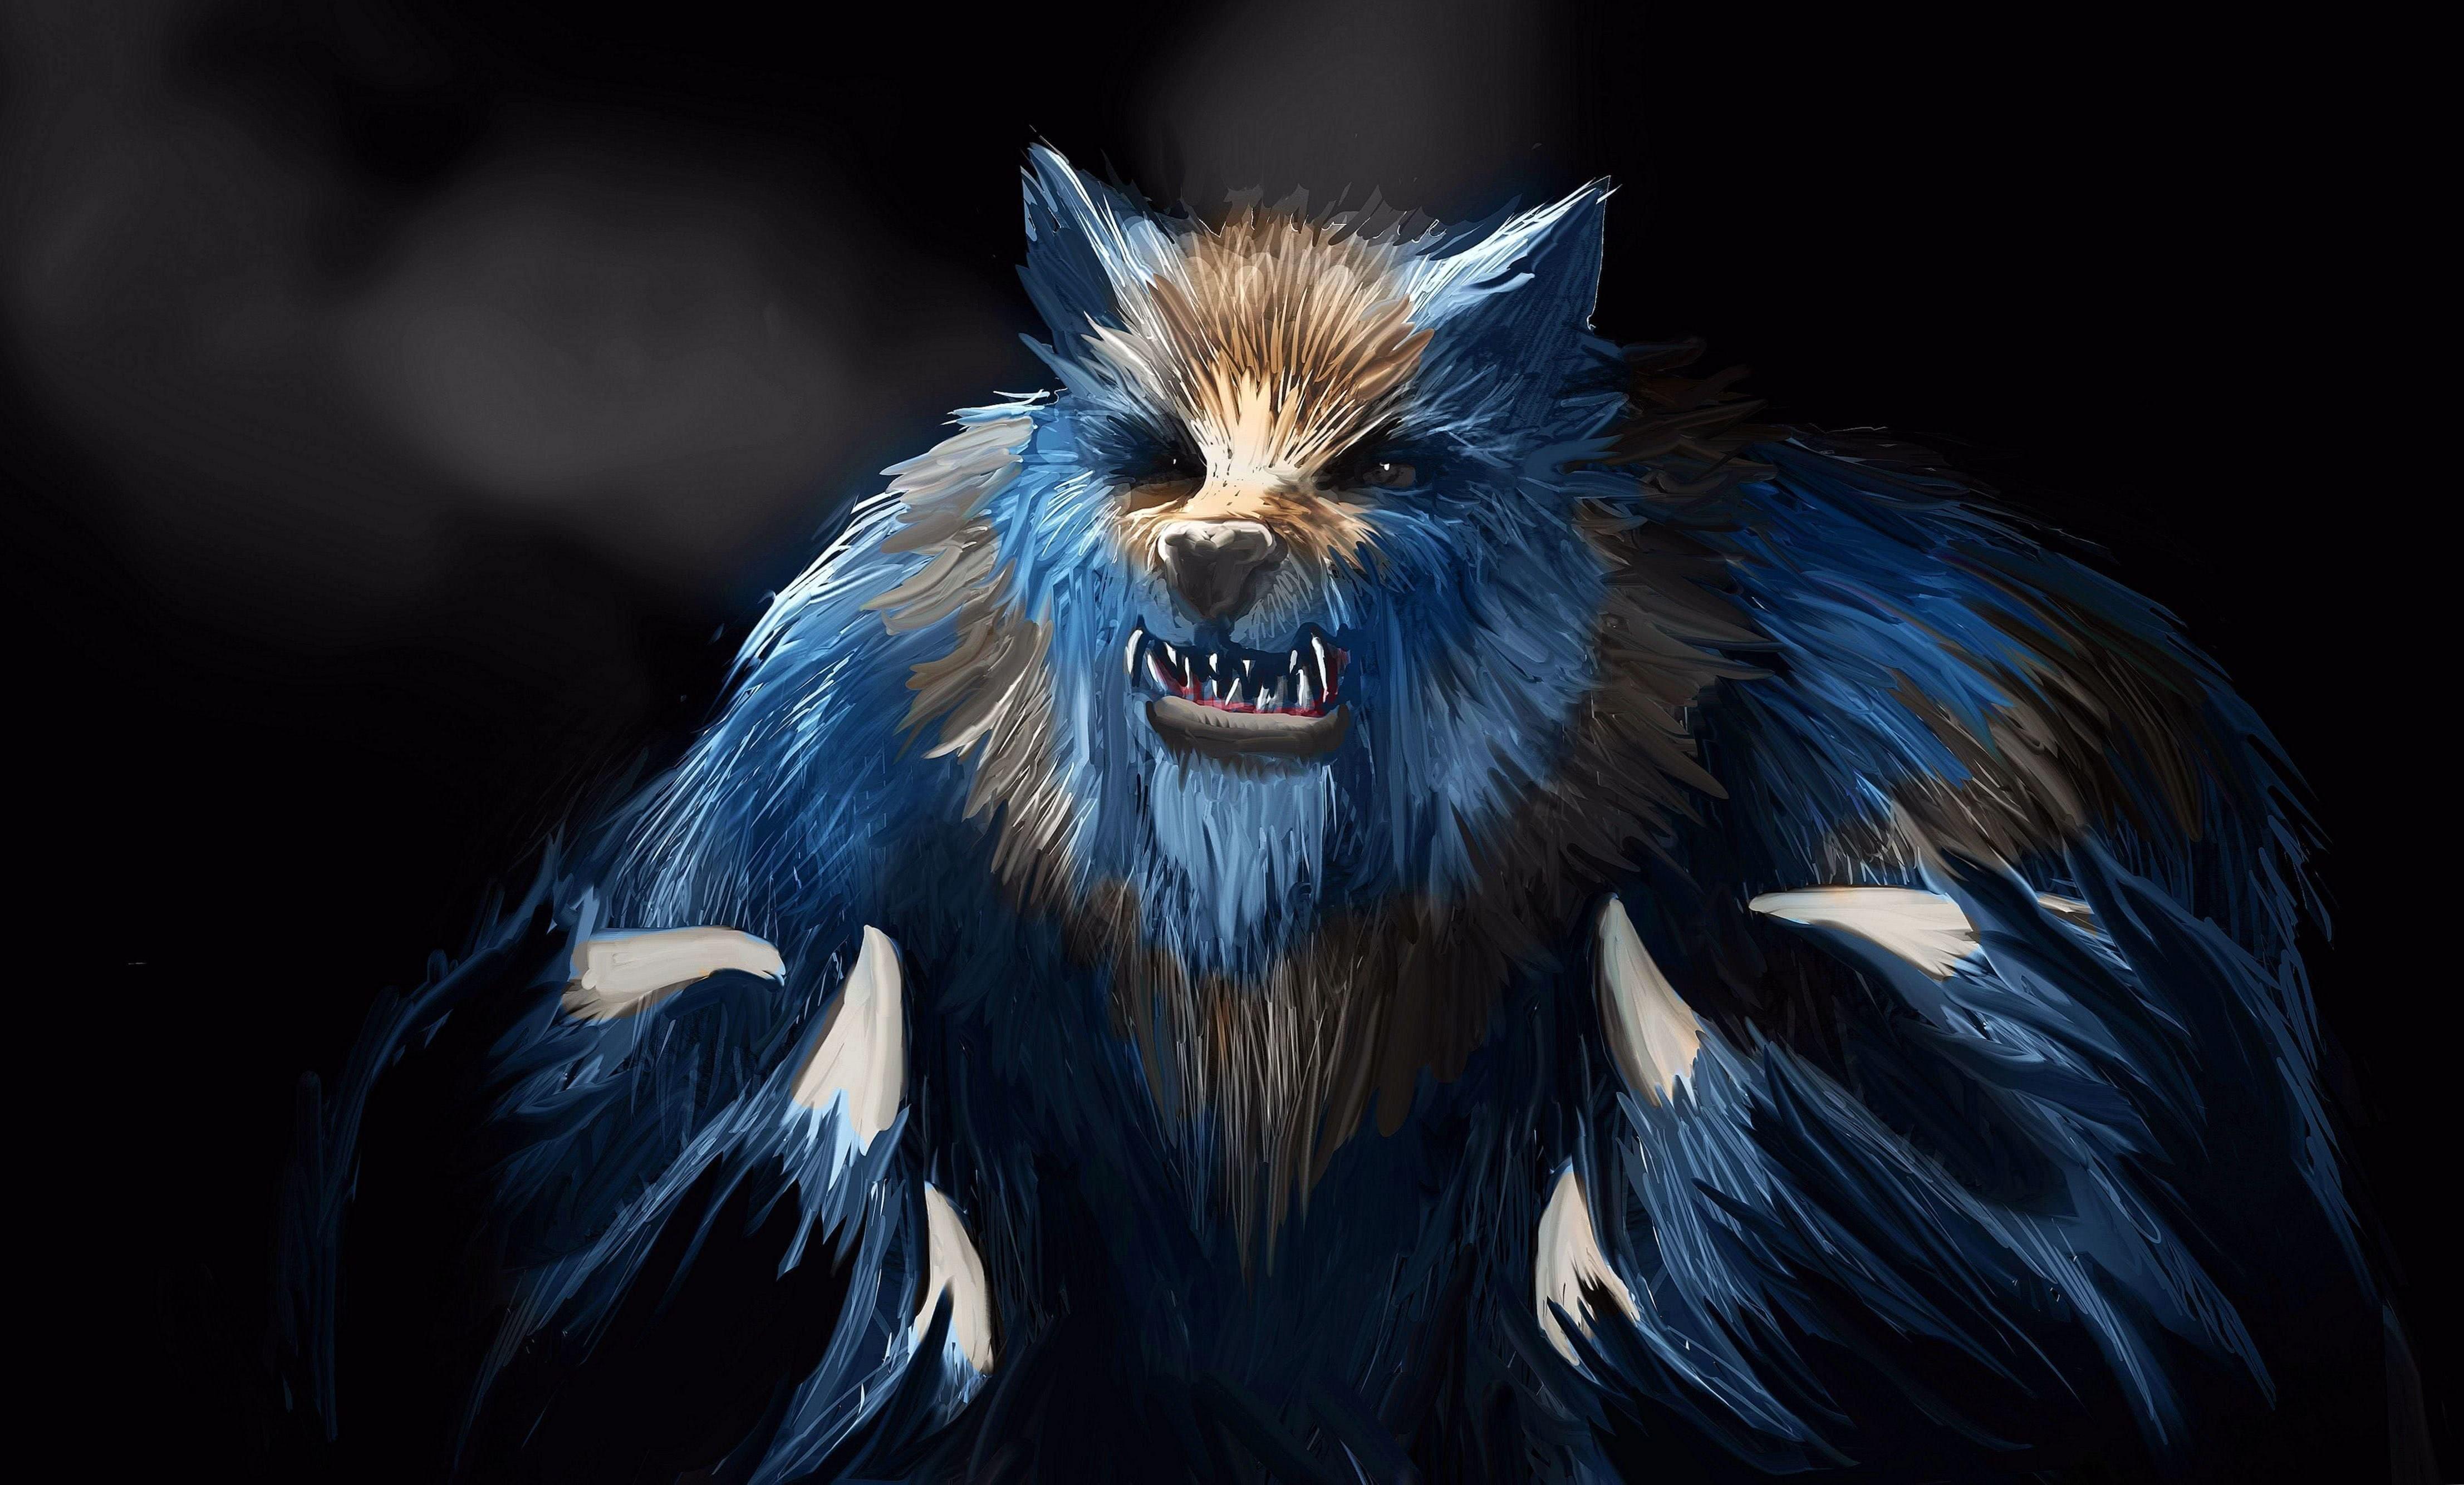 Free Wallpapers 4k Ultra Hd Werewolf Wolf Wallpapers Pro